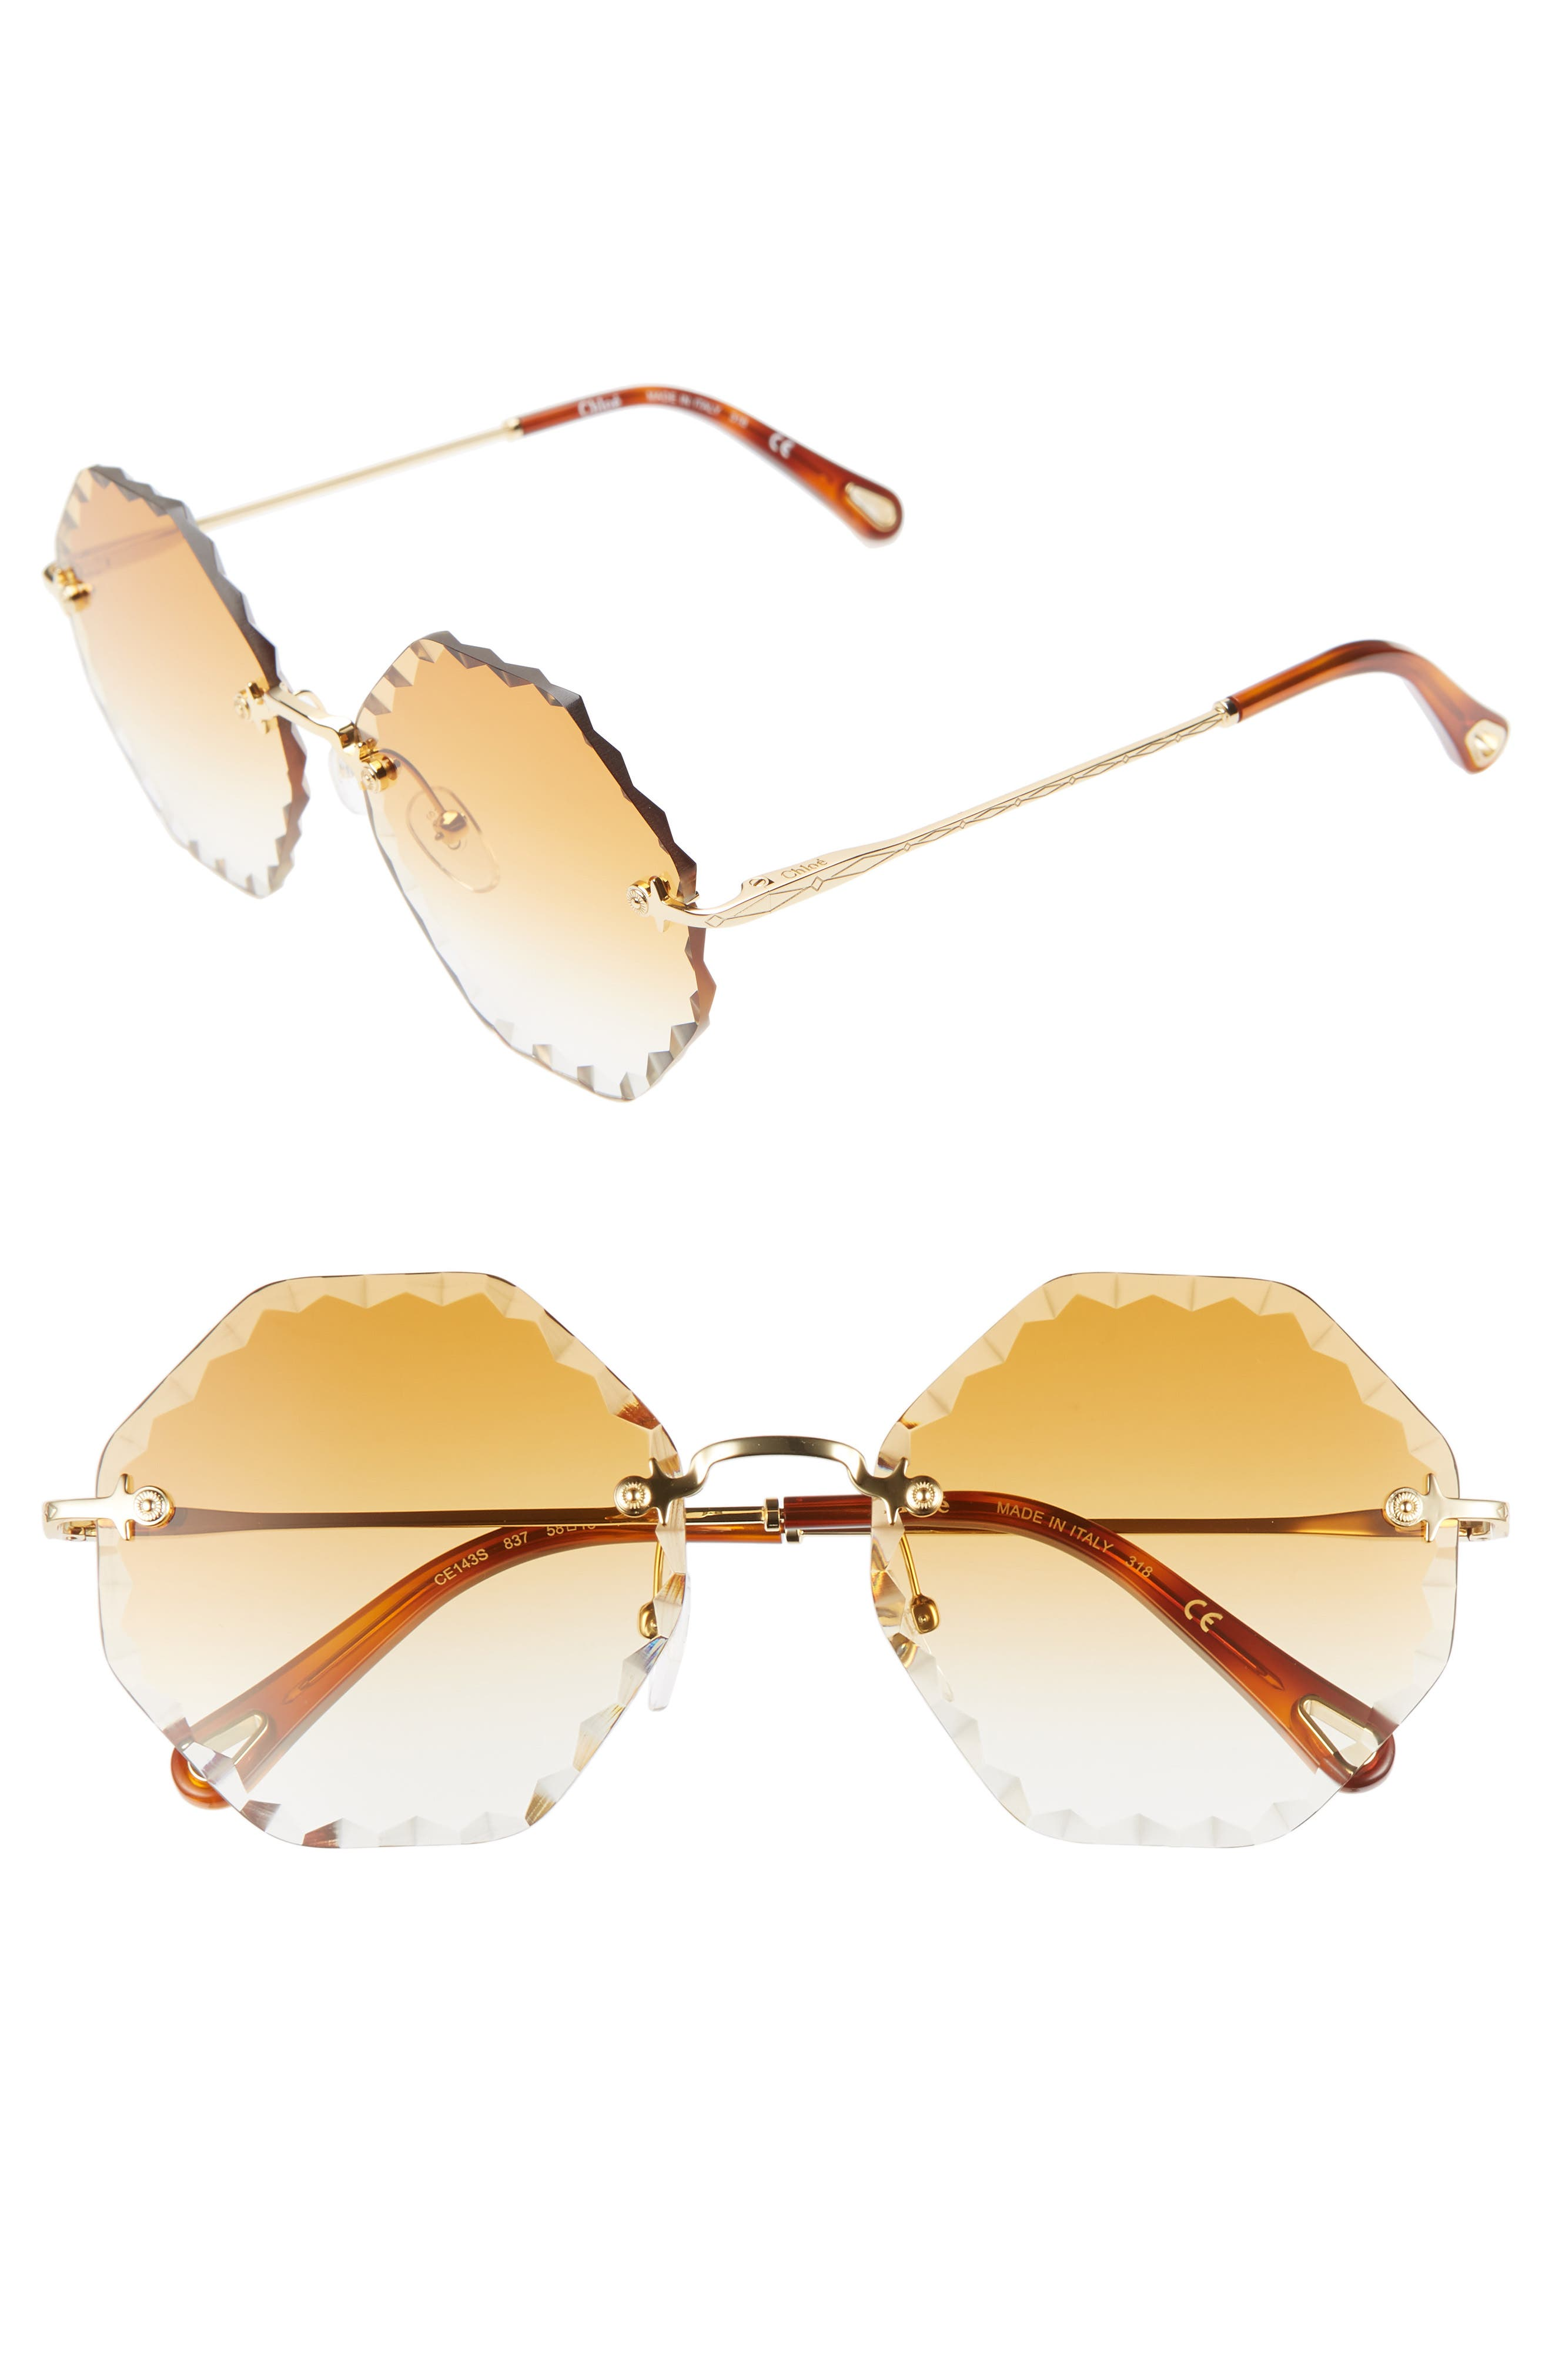 Chloe Rosie 5m Gradient Octagonal Rimless Sunglasses - Gold/ Gradient Brick